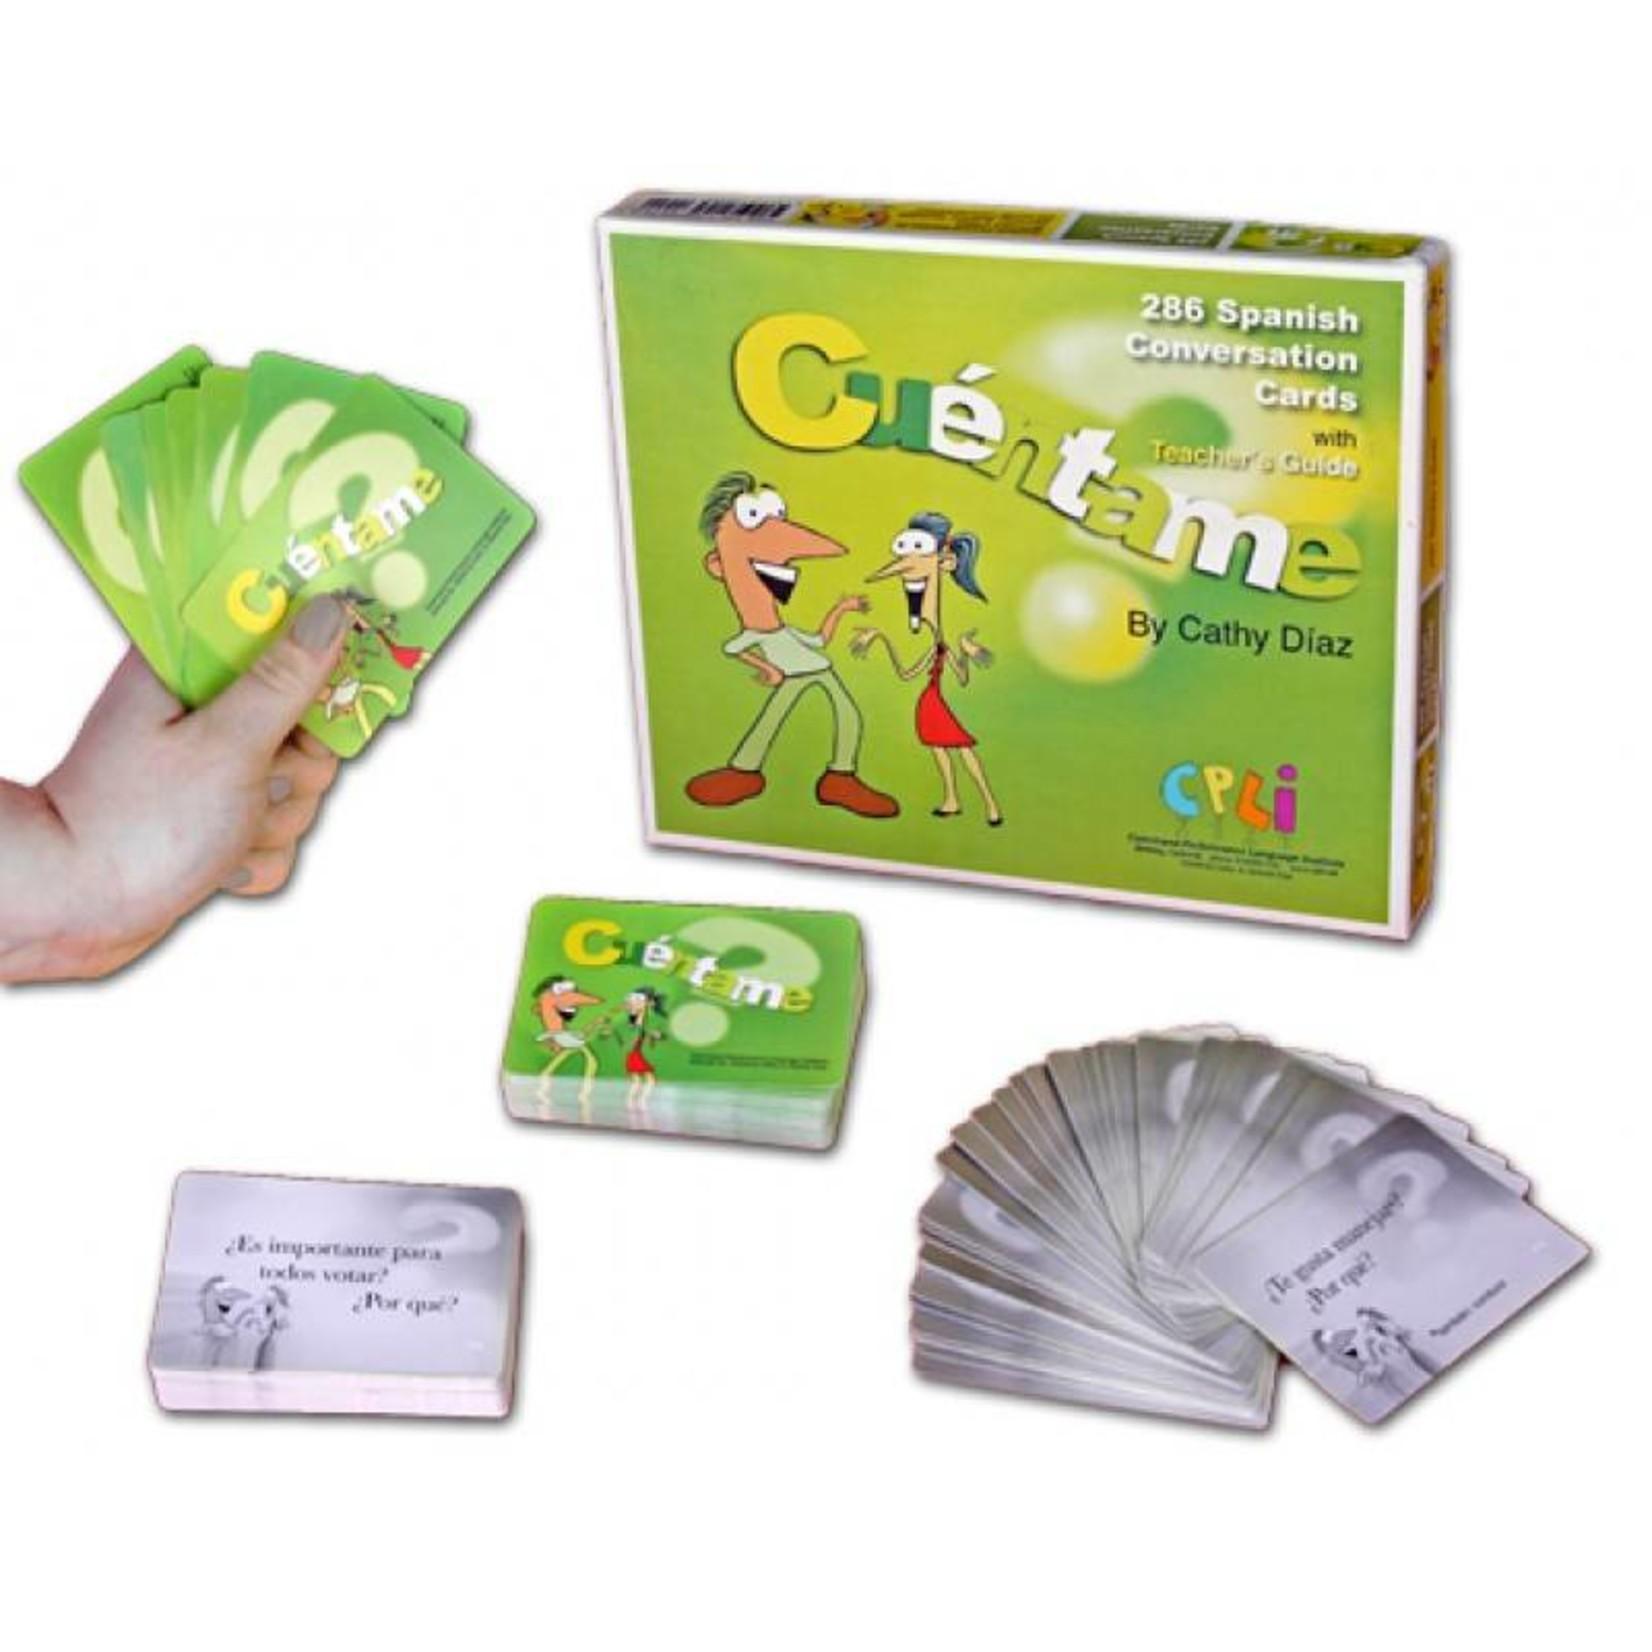 Command Performance Books Cuéntame: 286 Spanish Conversation Cards